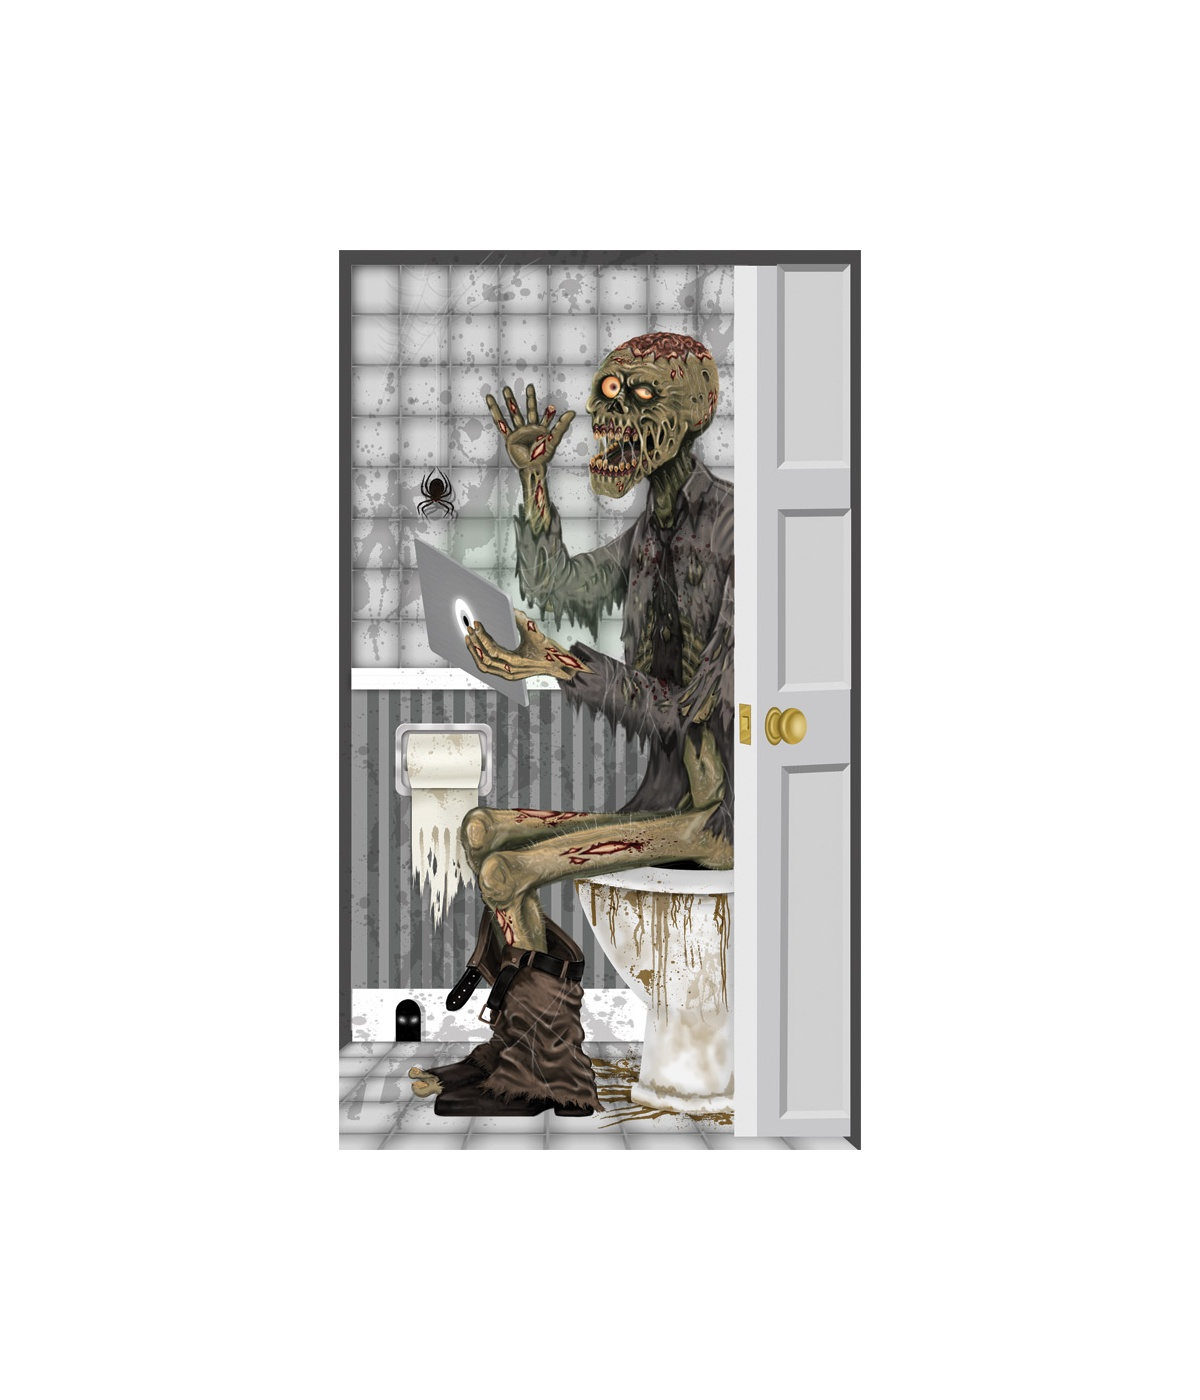 Zombie Toilet Door Cover Decoration Props Amp Decorations